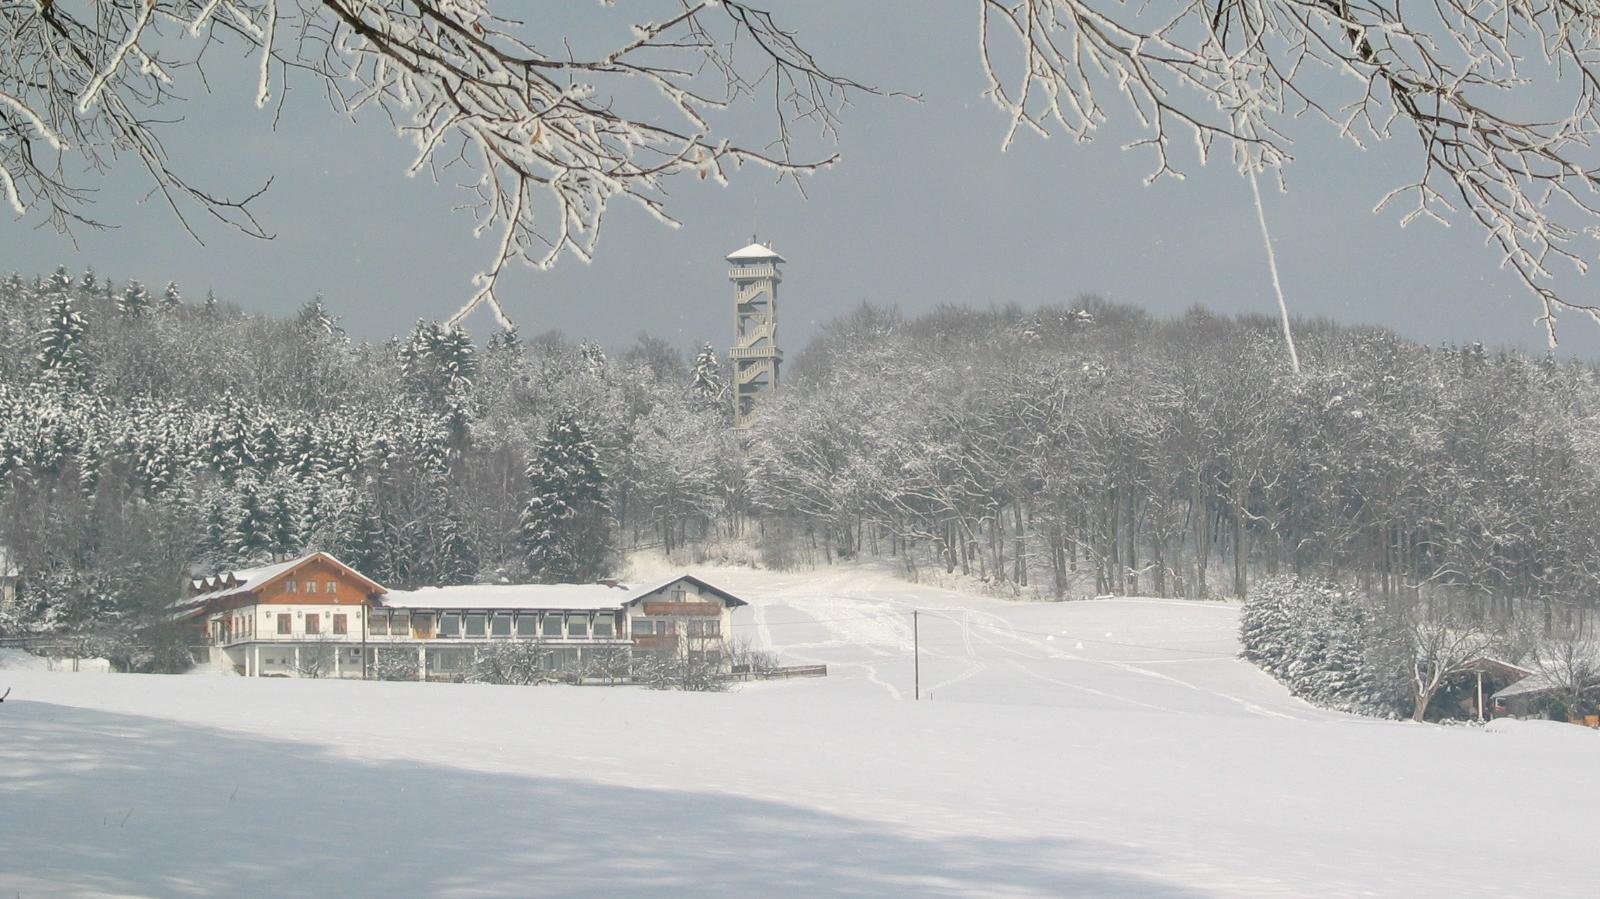 Ebersberger Aussichtsturm im Schnee